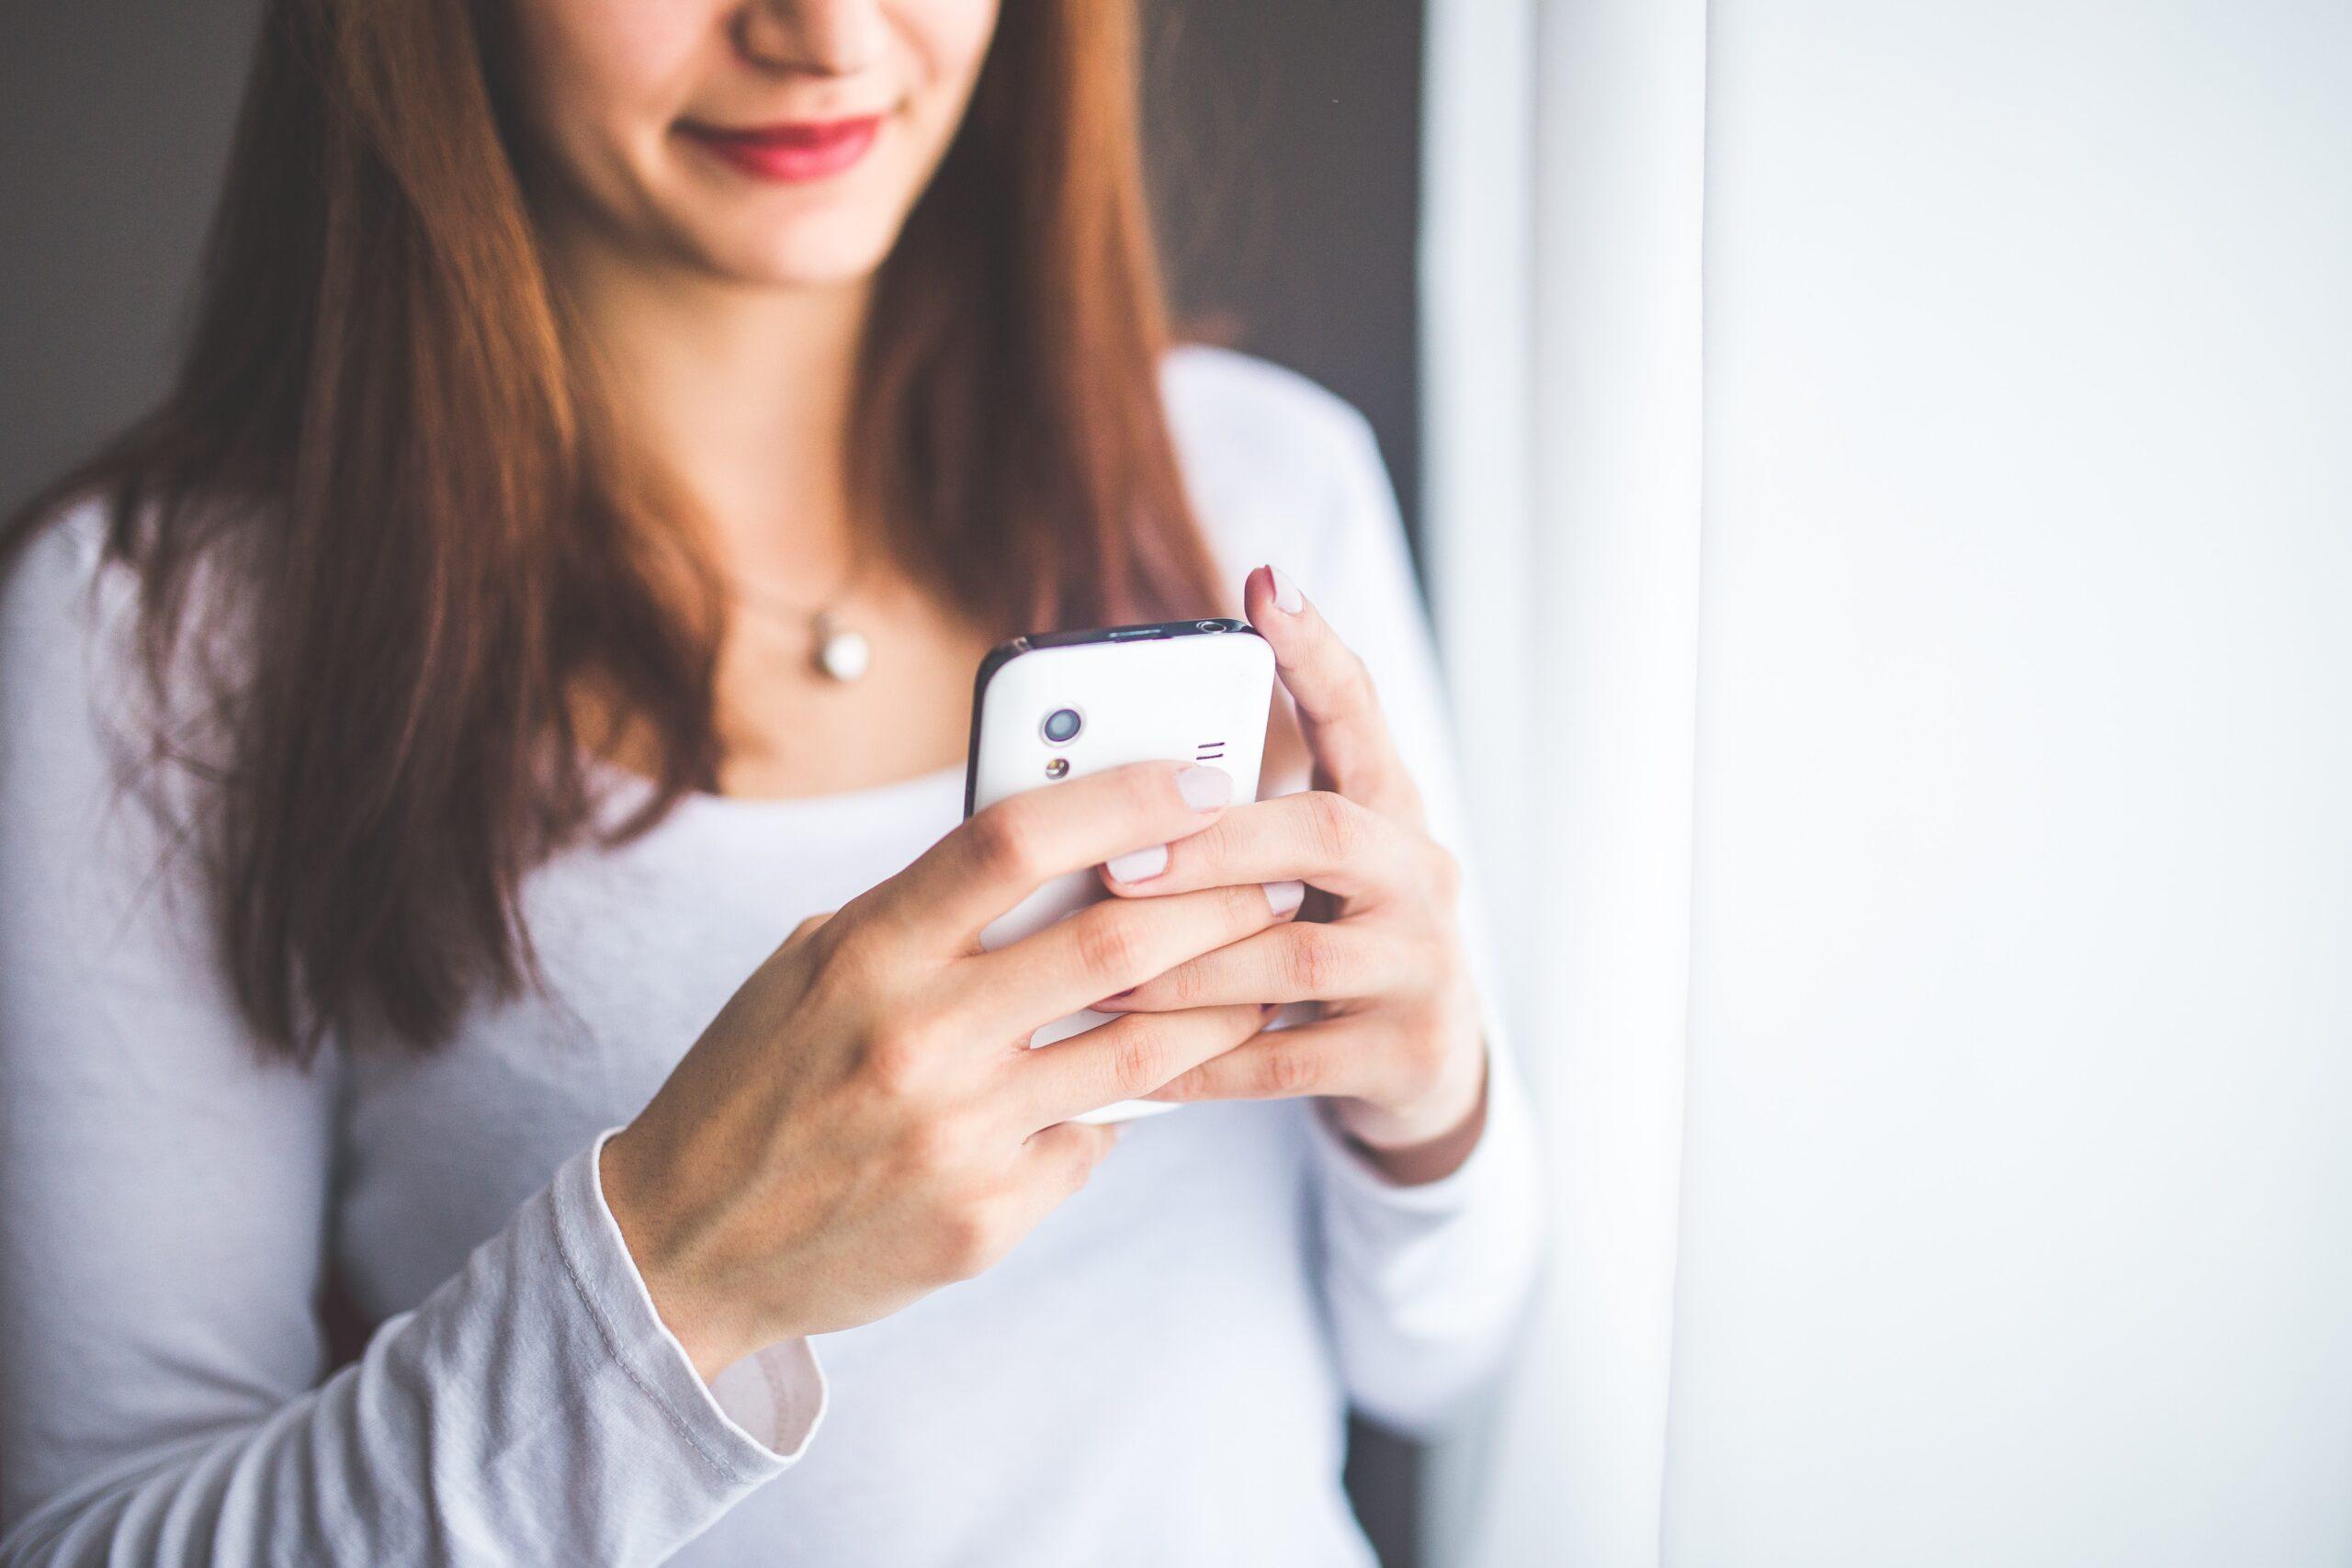 woman checking mobile phone